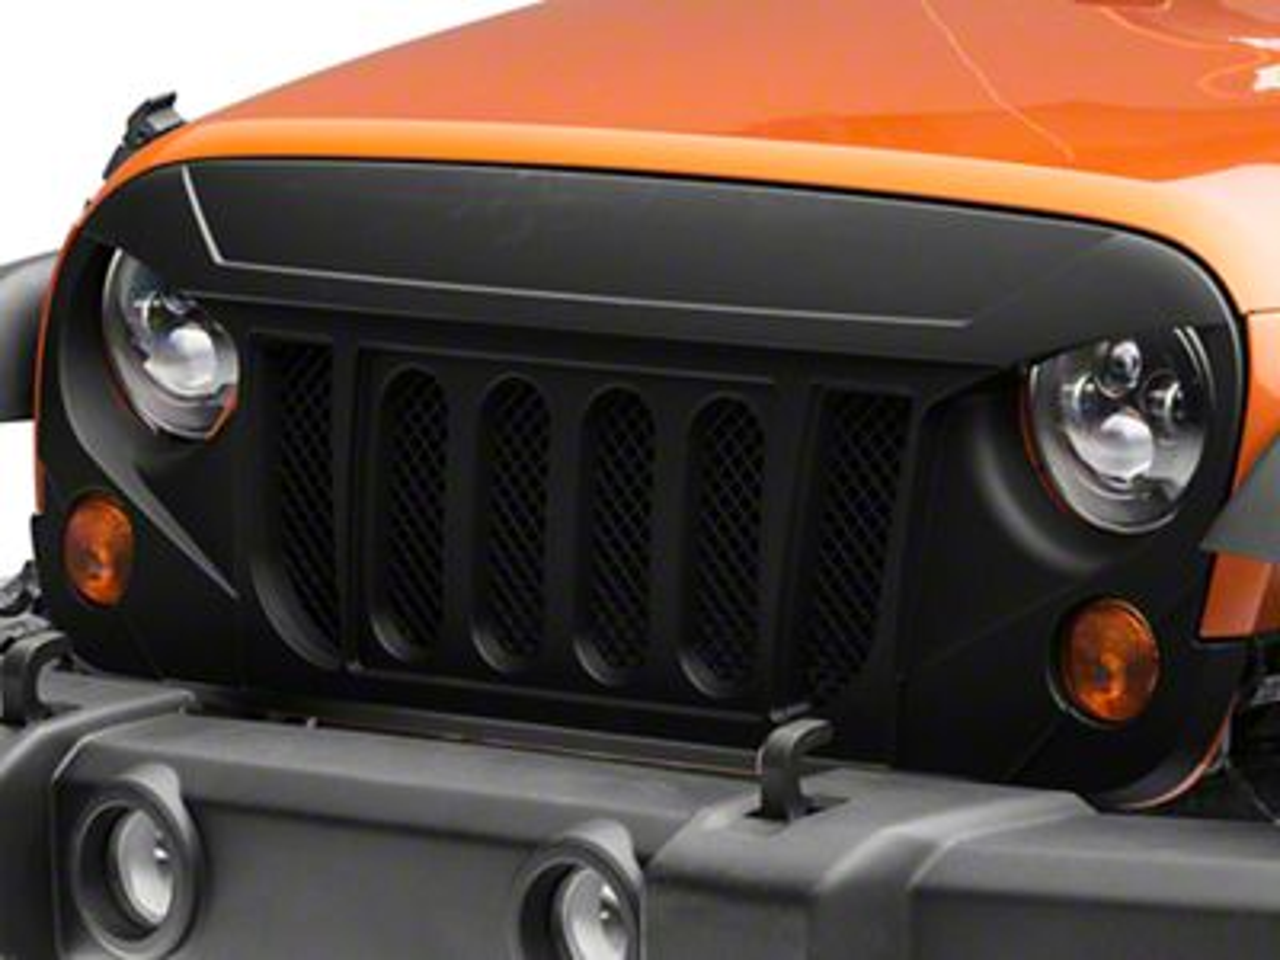 RedRock 4x4 Avenger Grille - Matte Black (07-18 Jeep Wrangler JK)